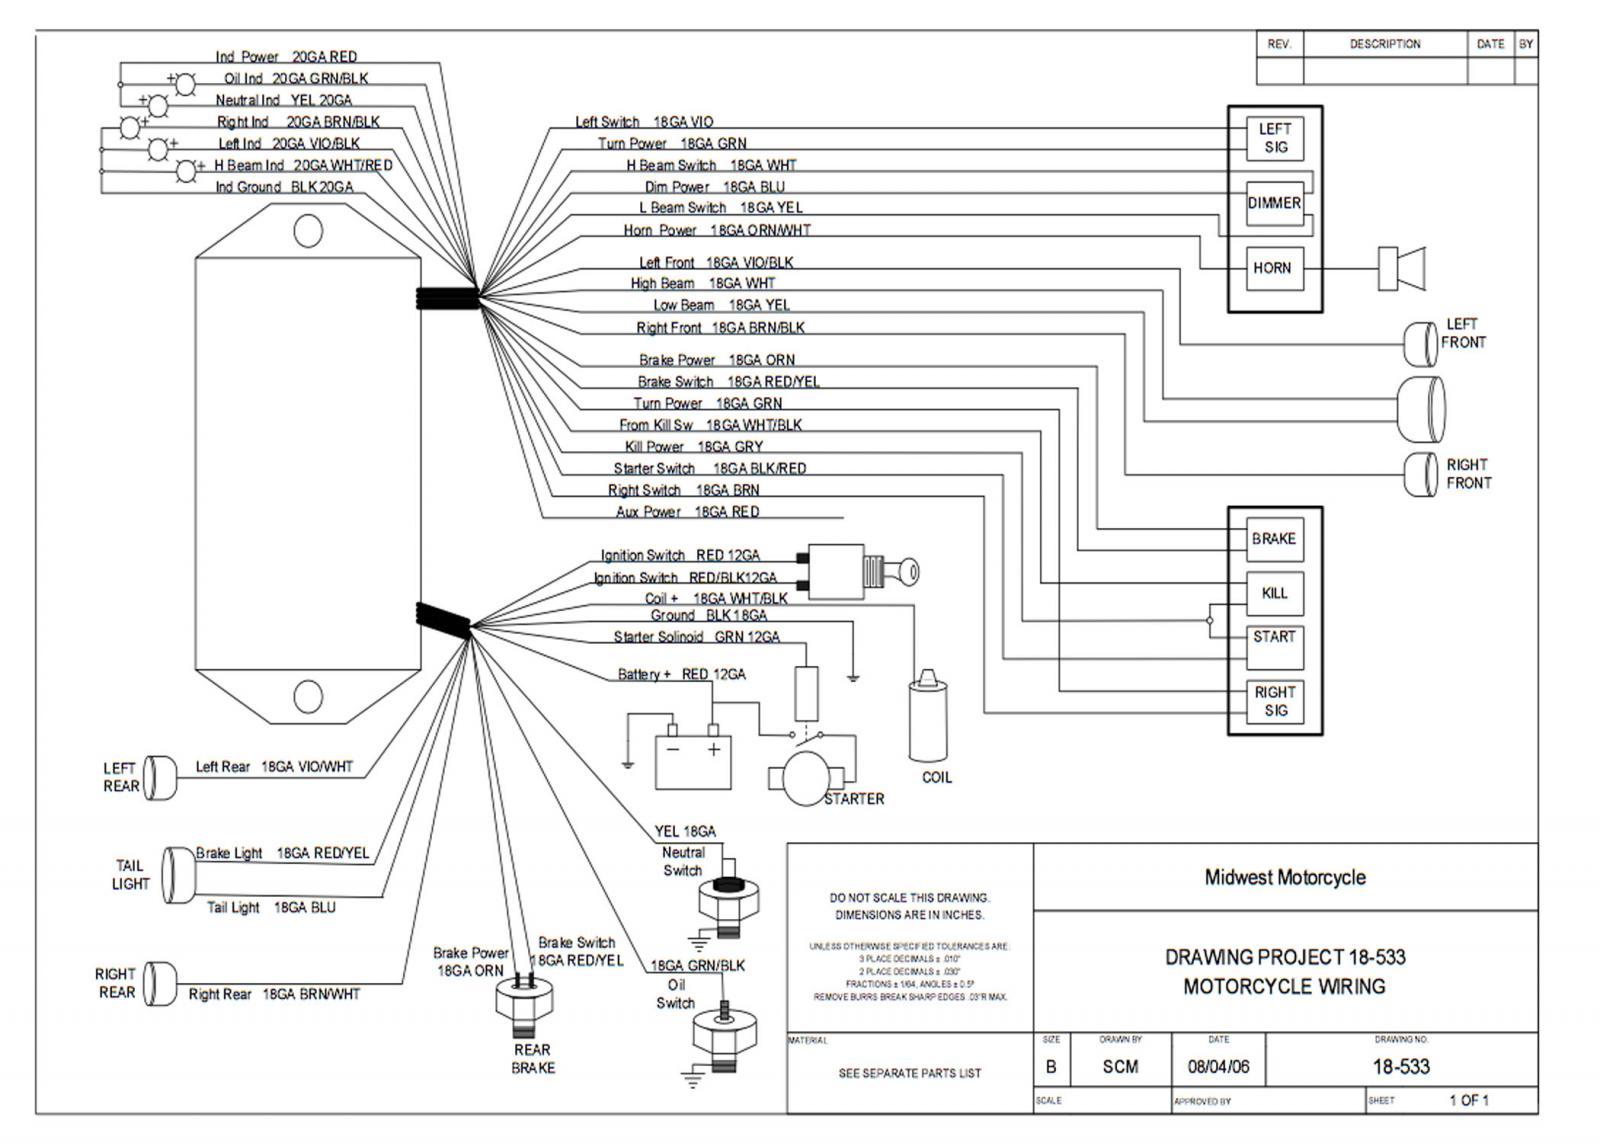 ultima wiring harness diagram